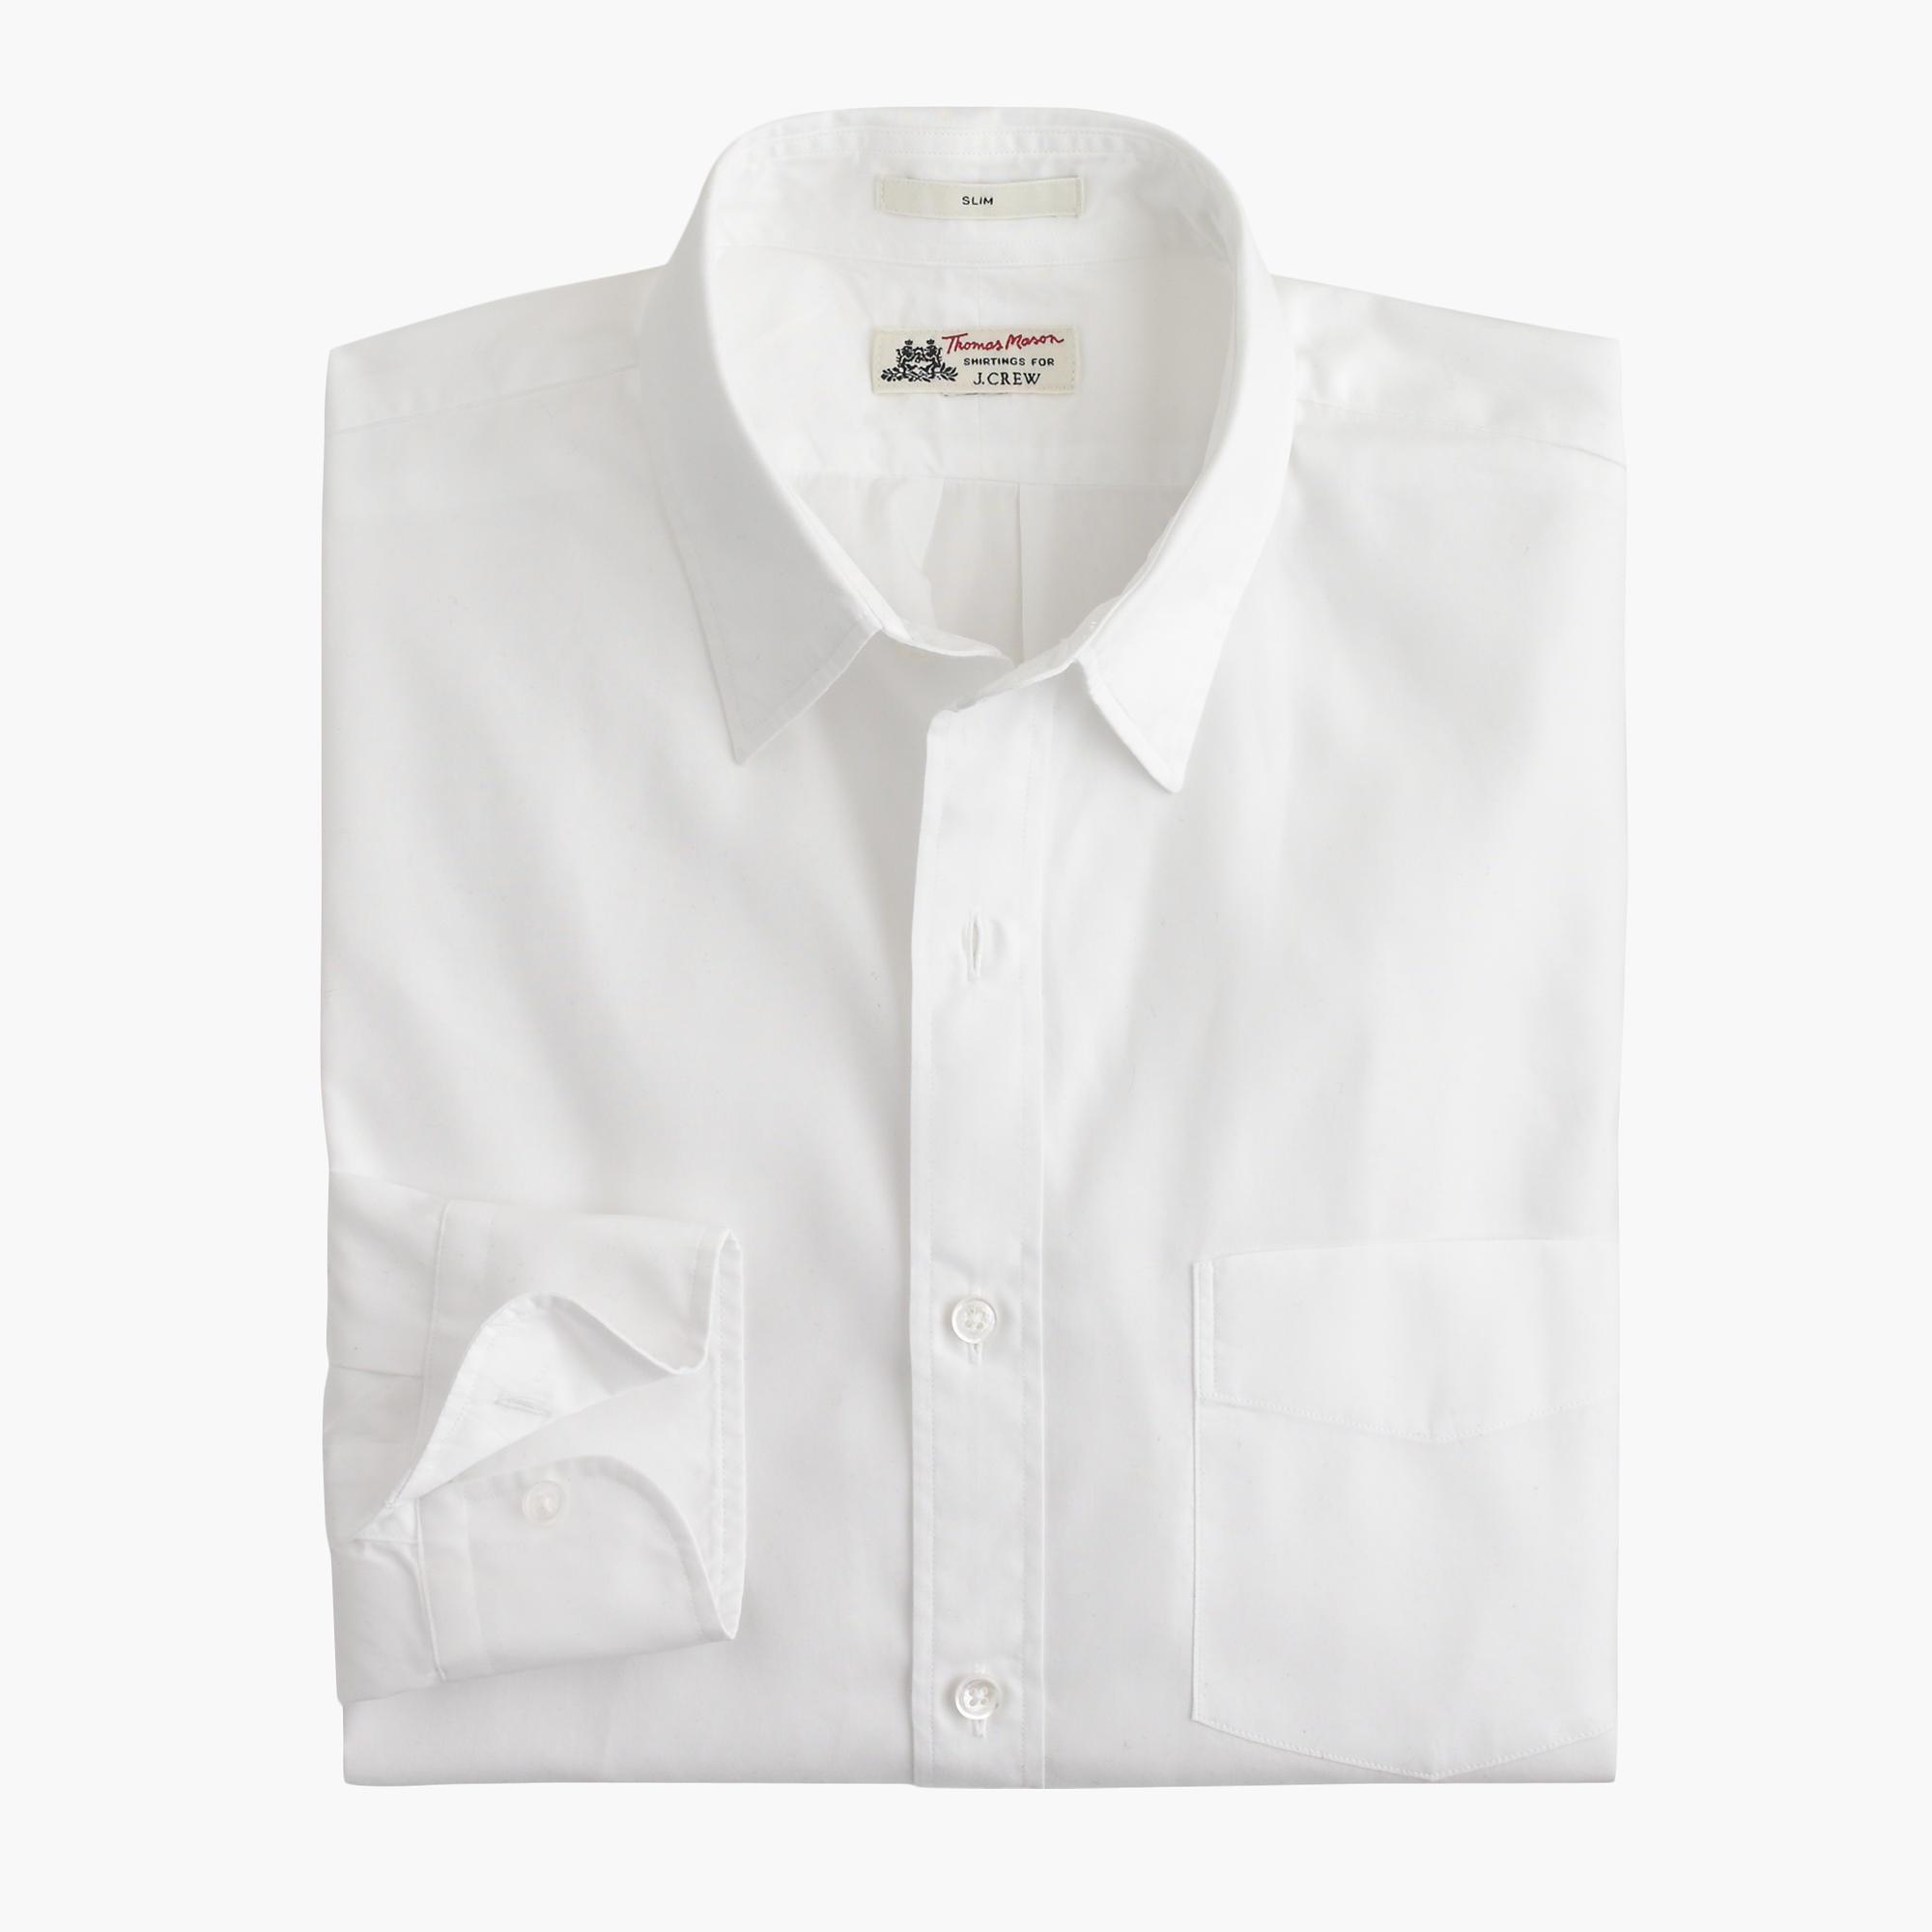 Slim thomas mason for j crew shirt men 39 s shirts j crew for Thomas mason dress shirts